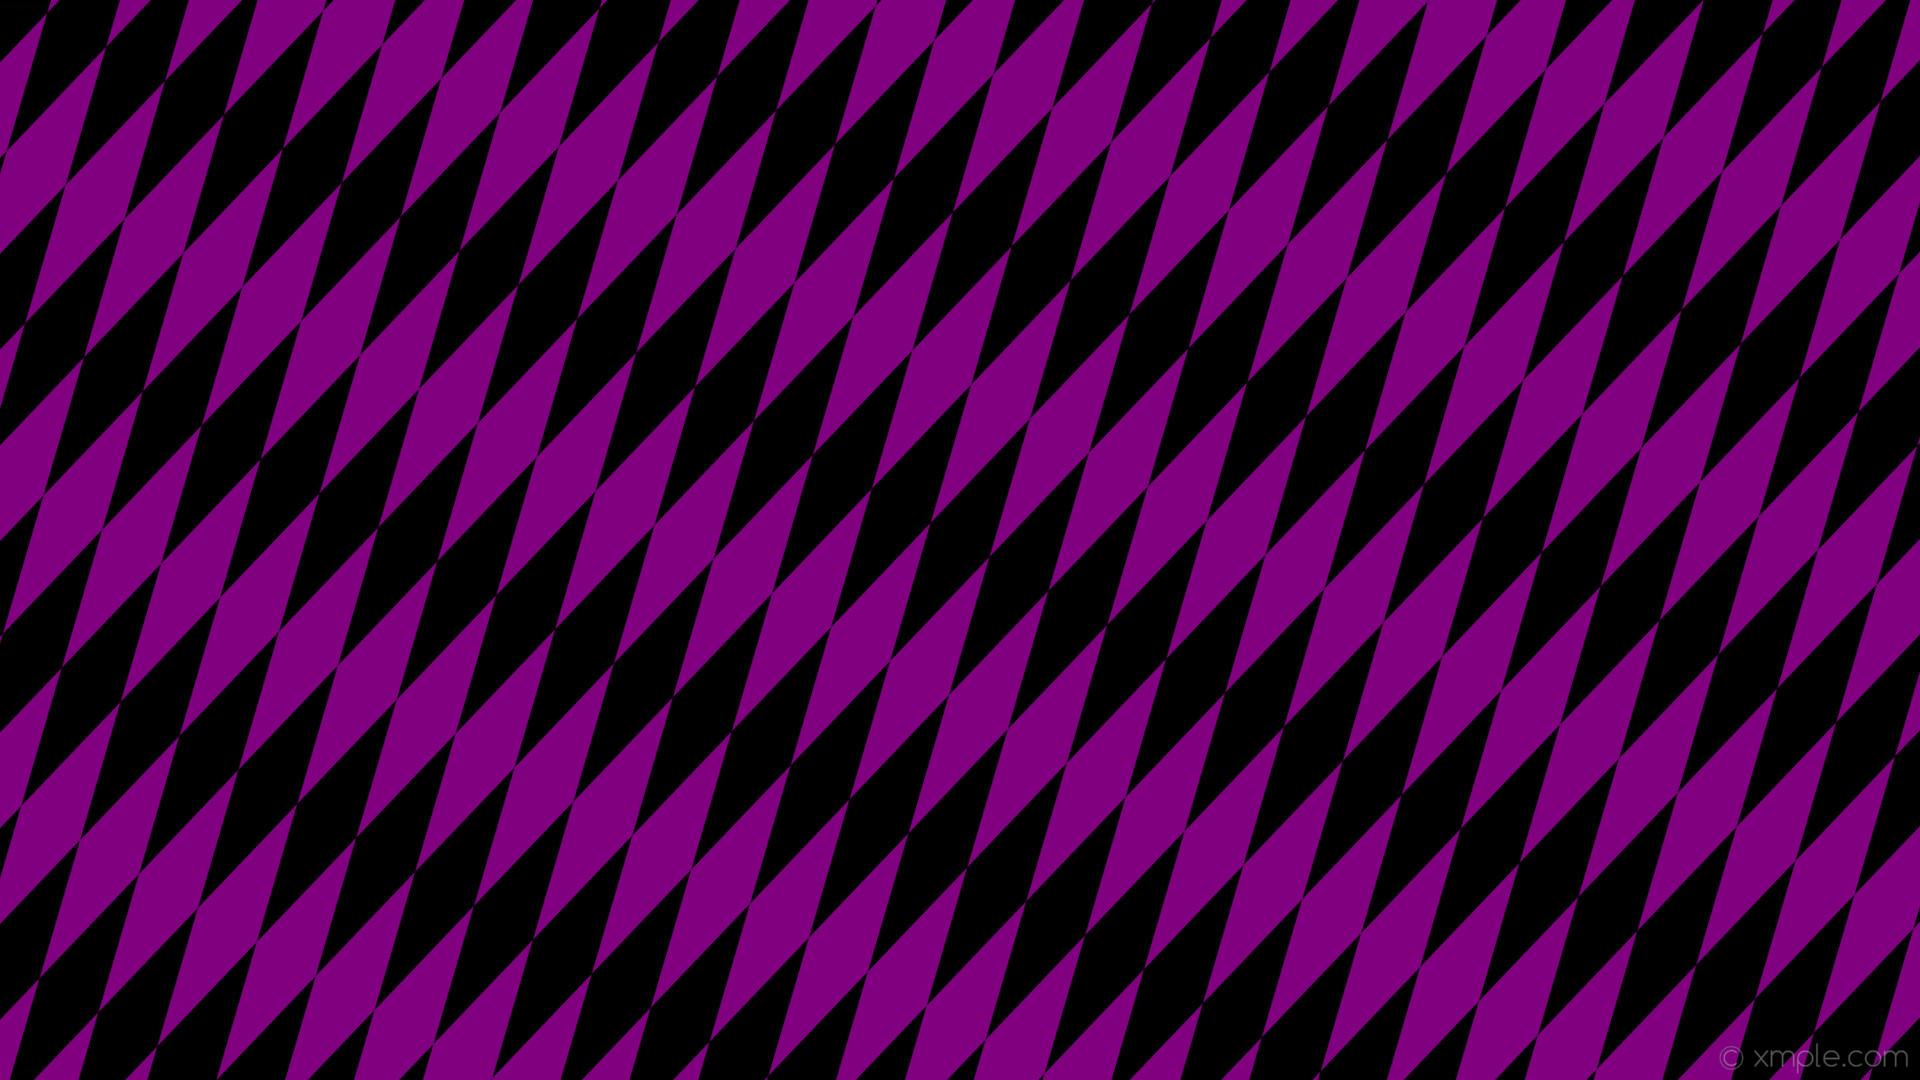 wallpaper rhombus black lozenge purple diamond #000000 #800080 60° 280px  68px